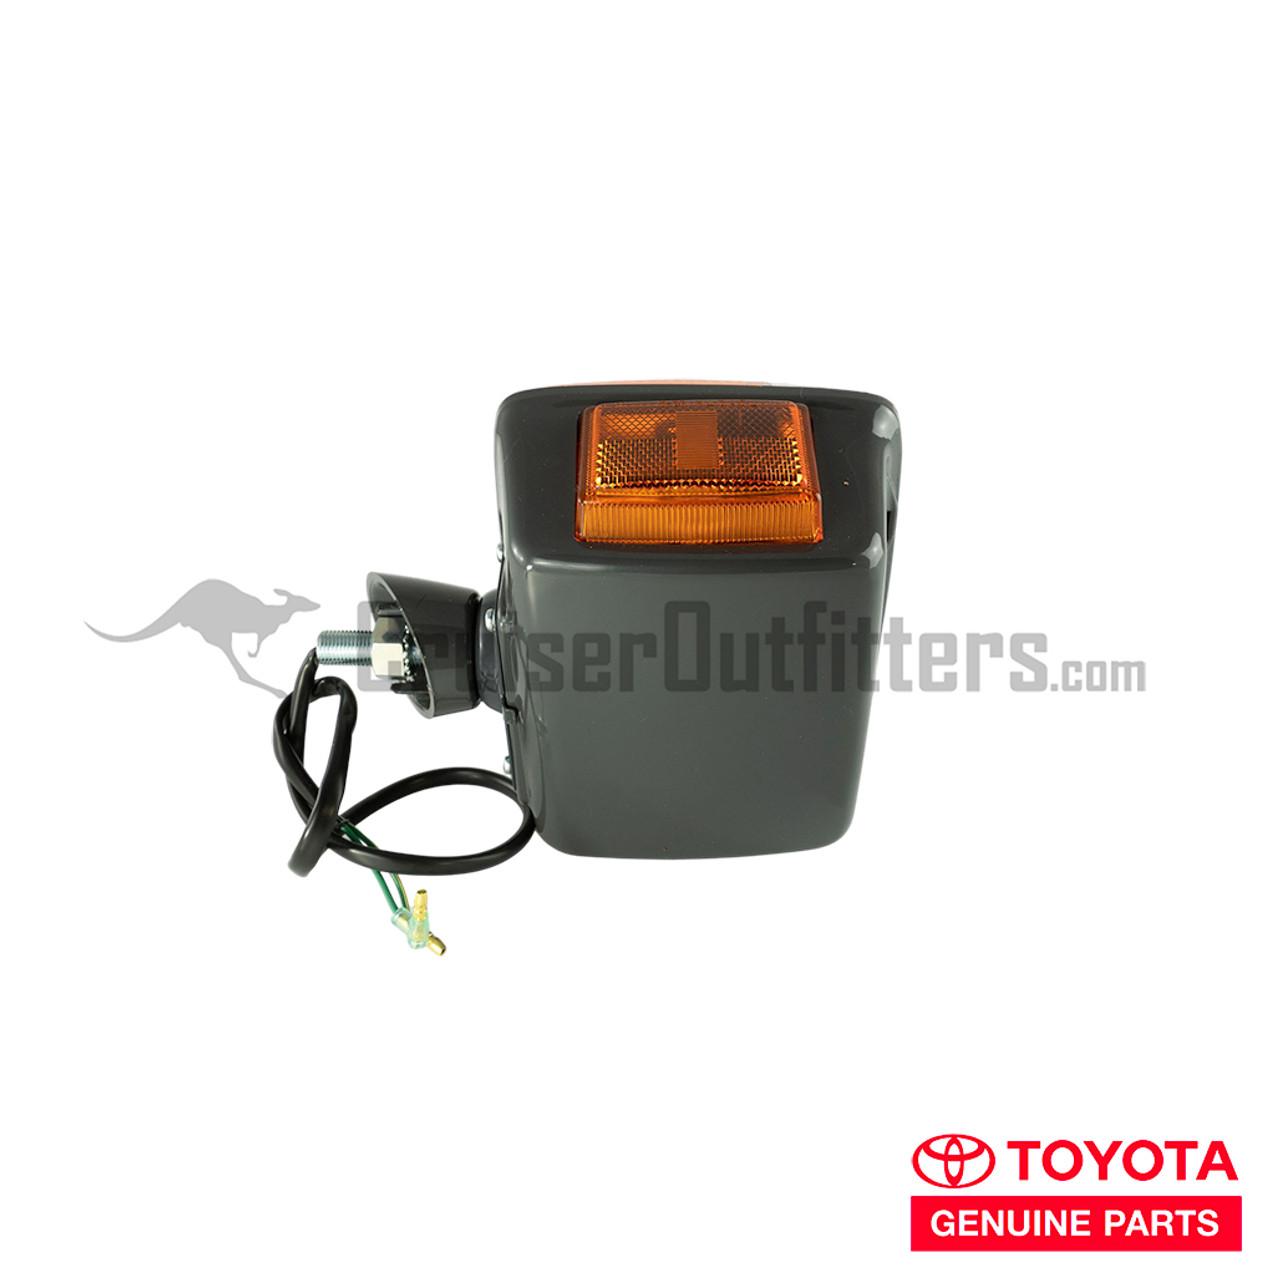 Front Turn Signal Assembly - OEM Toyota - Fits 4x LH (LT69035LOEM)